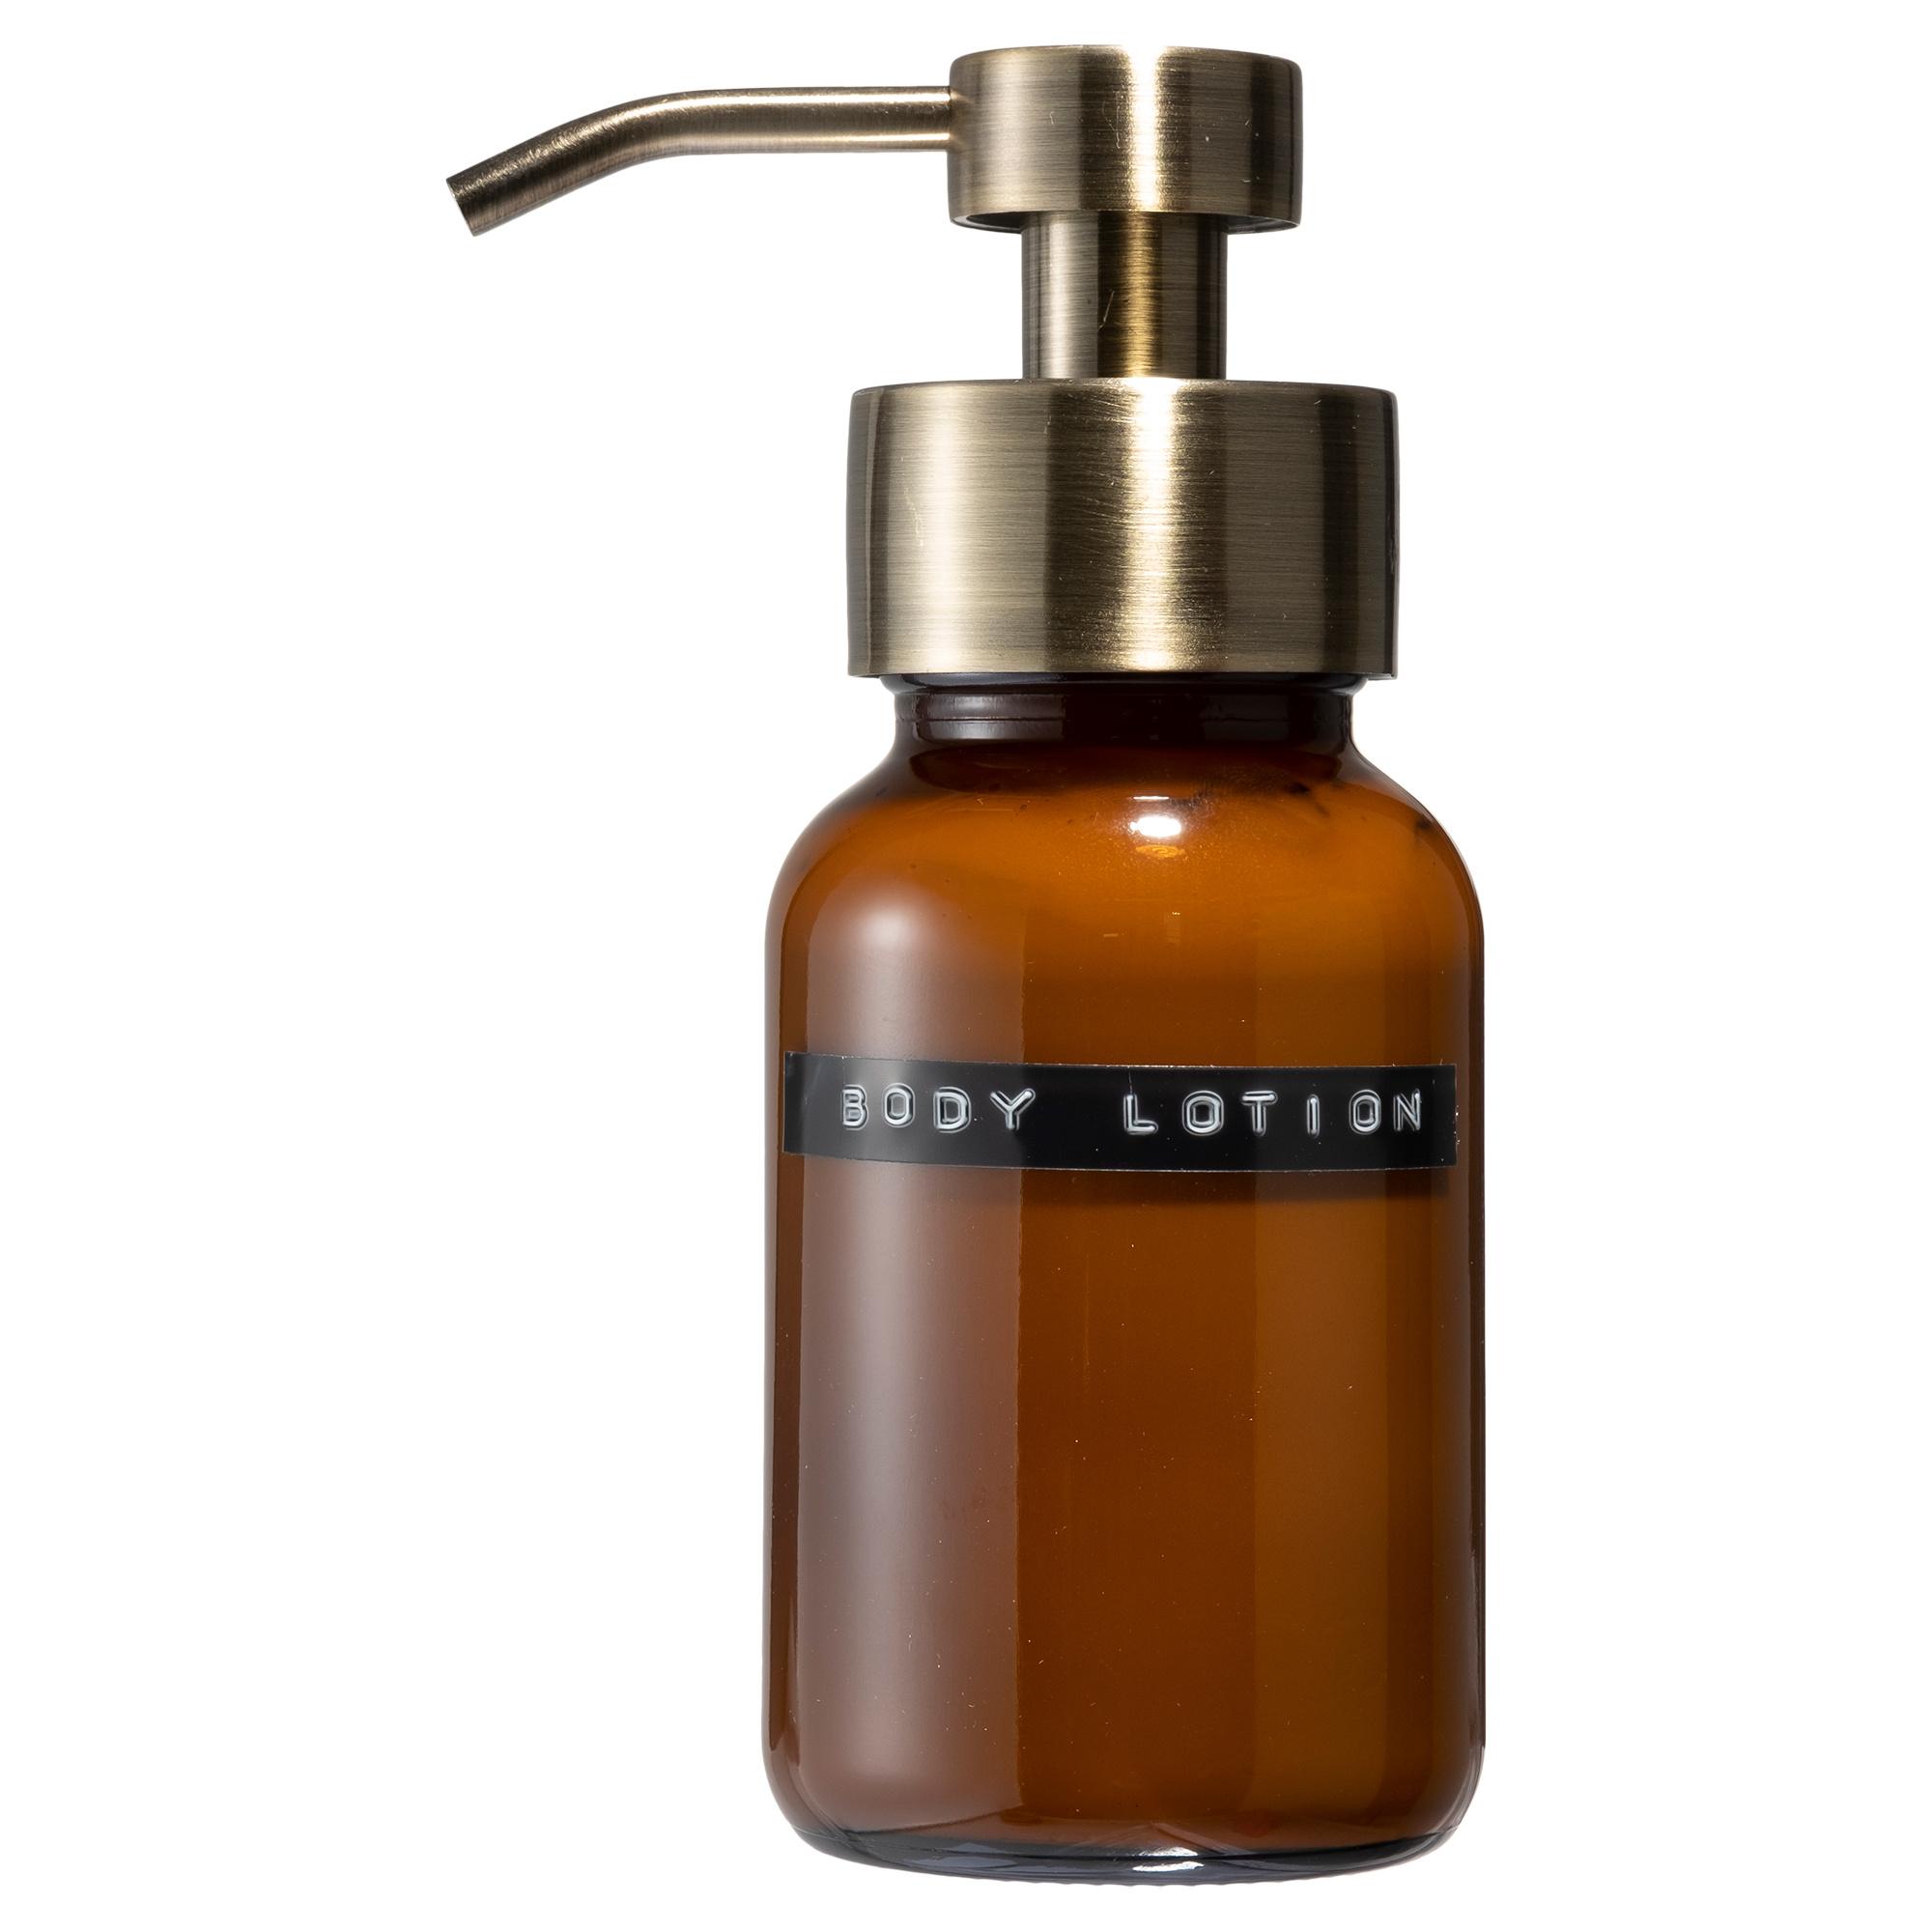 Body Lotion amber brass 250ml 'body lotion'-1